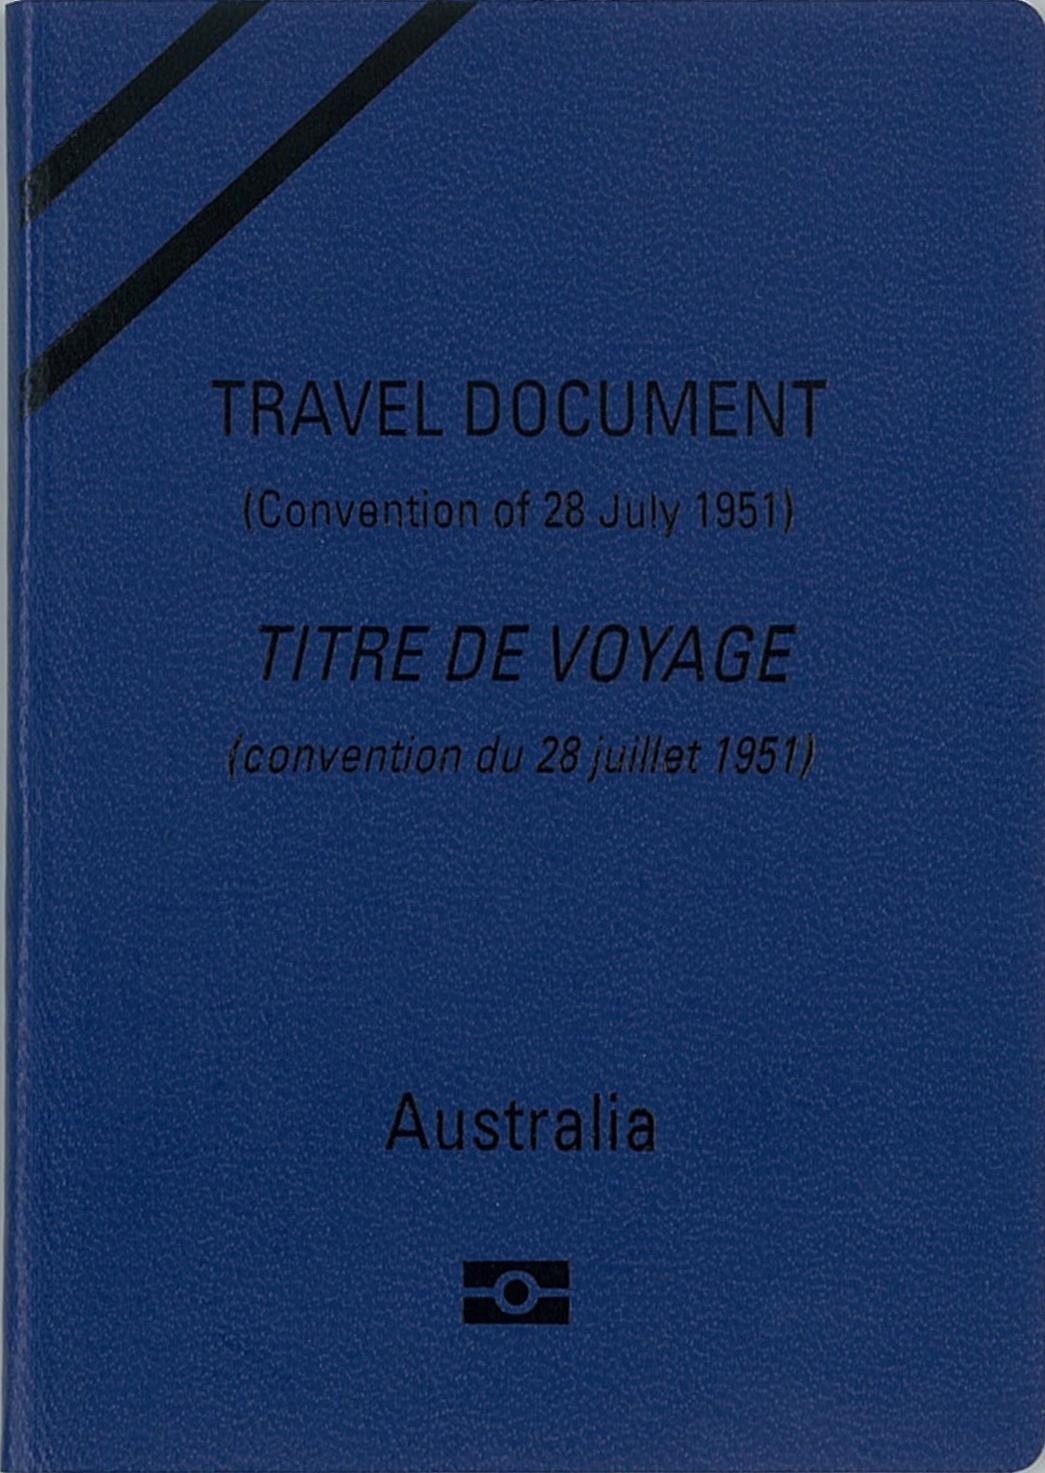 Australian Travel To Hong Kong Visa